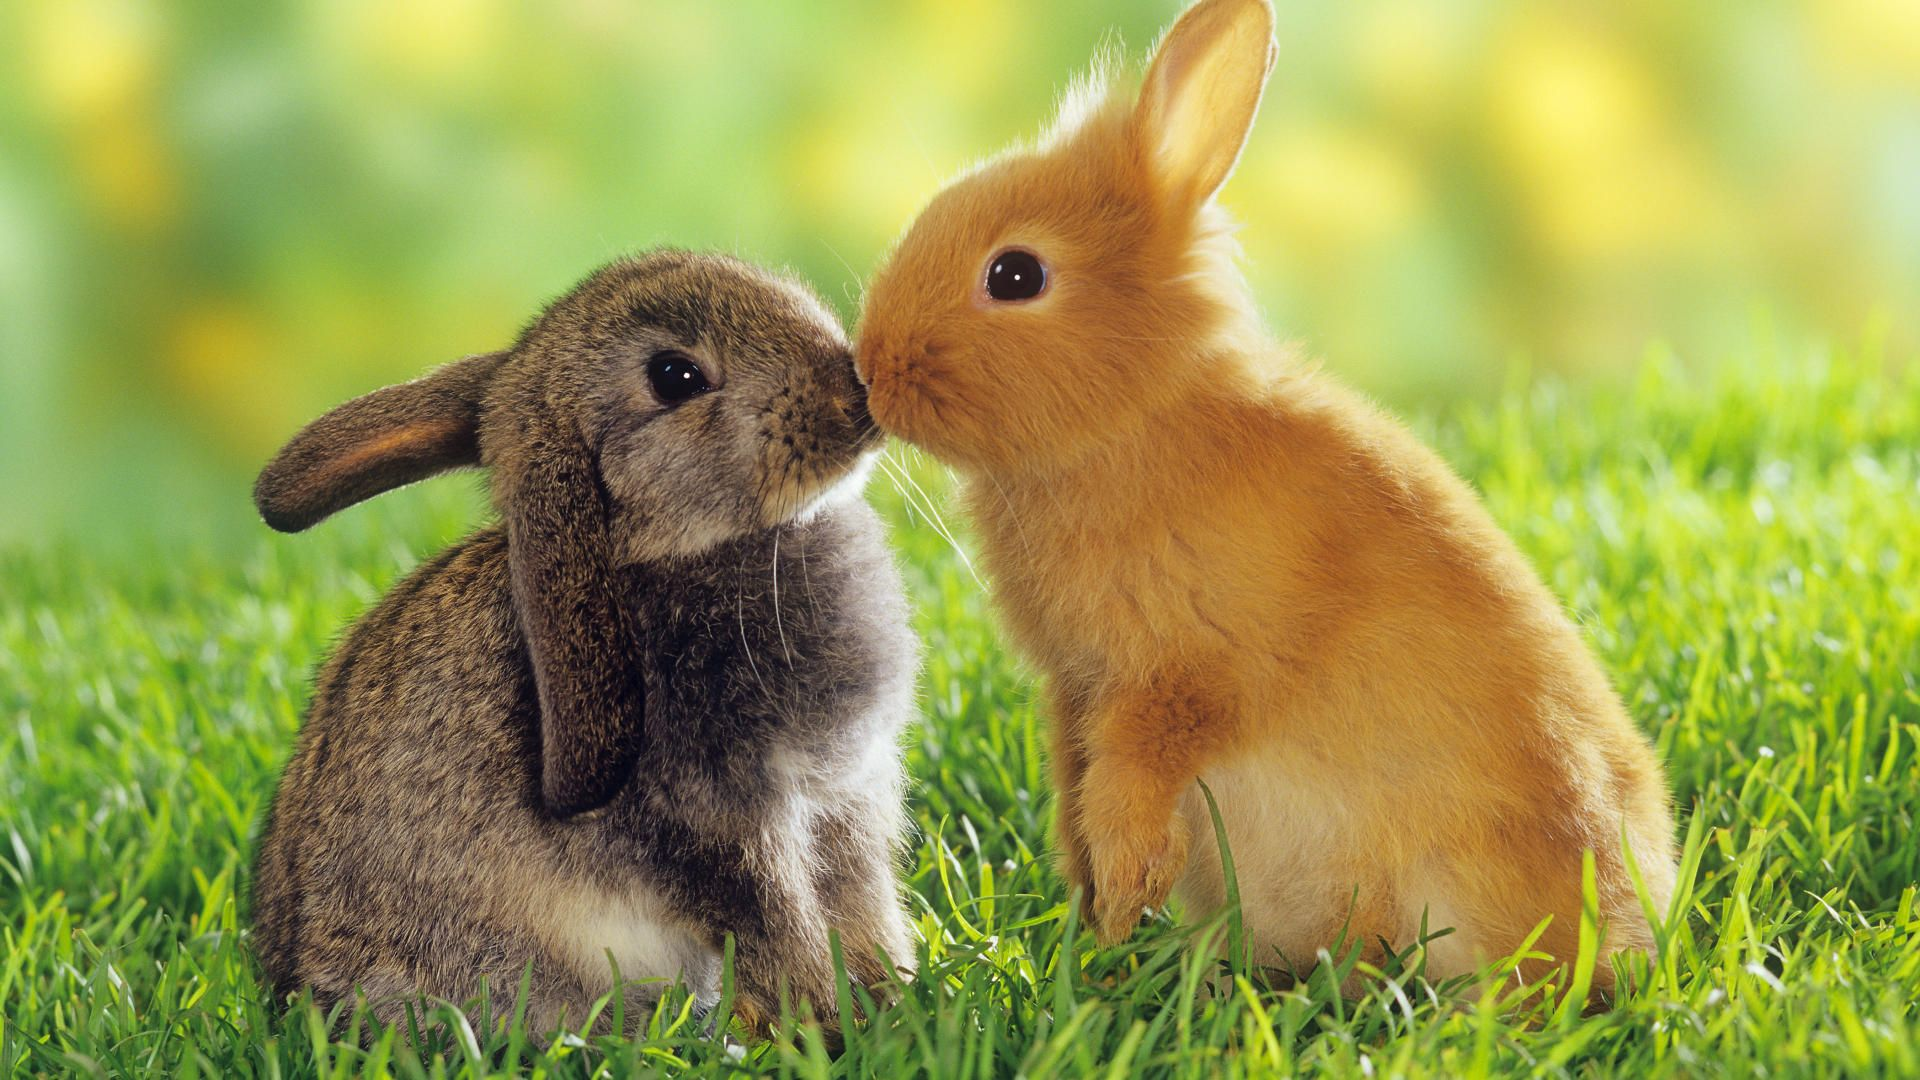 What A Cute Pear Of Rabbits Susseste Haustiere Tiere Niedliche Tierbilder